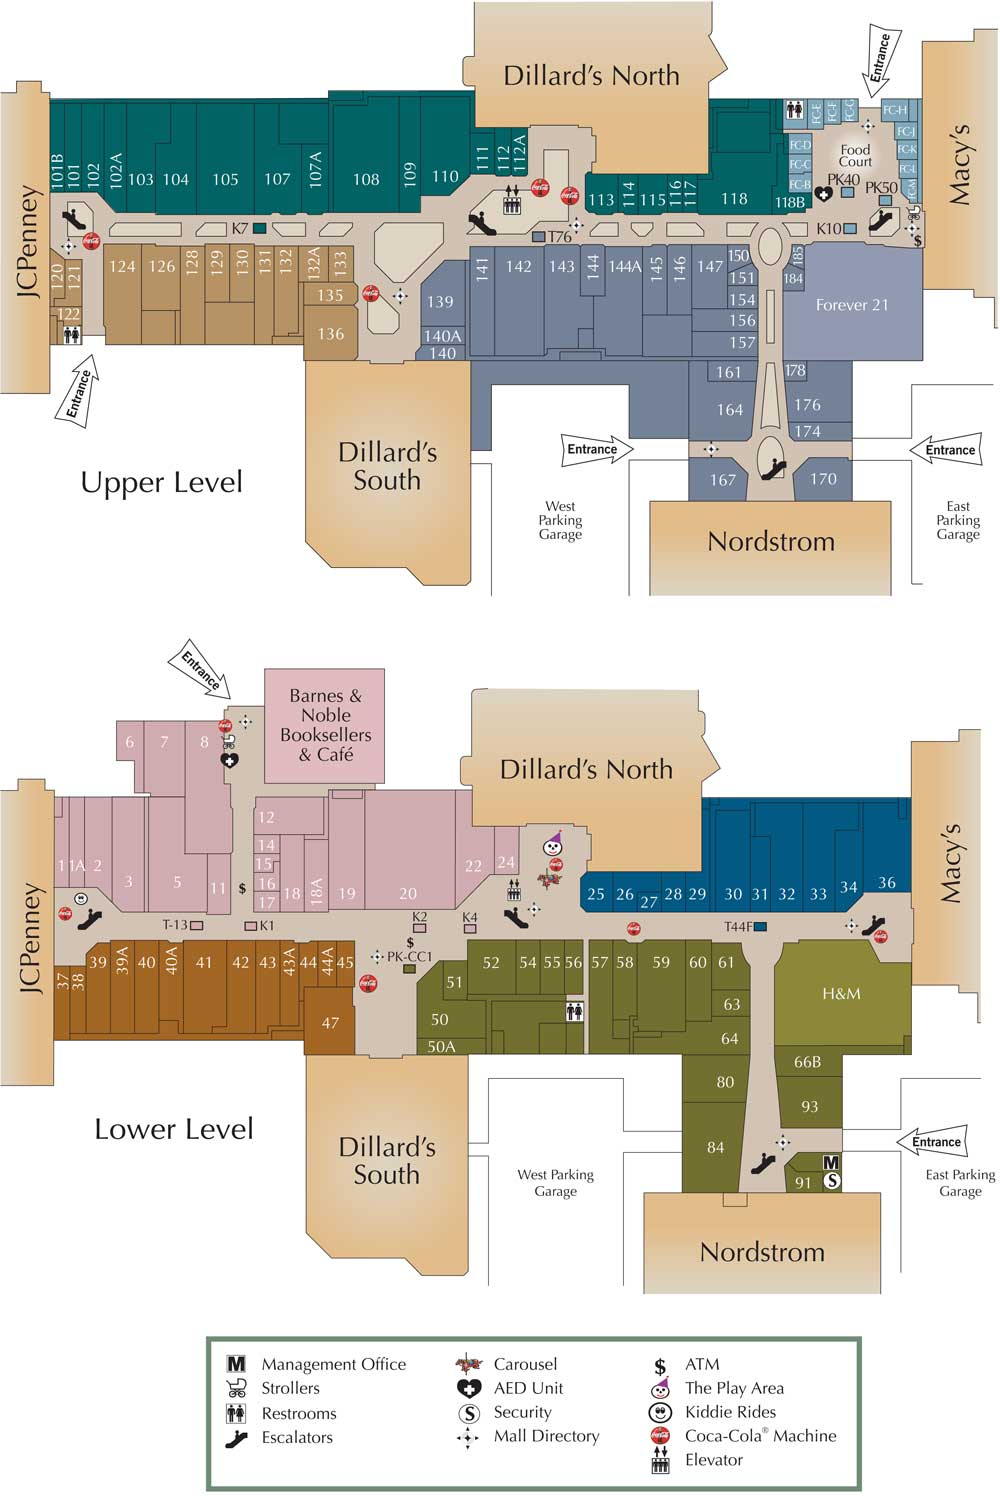 Oak Park Mall Map Visit Oak Park Mall in Overland Park, KS | Shopping, Dining & Fun Oak Park Mall Map